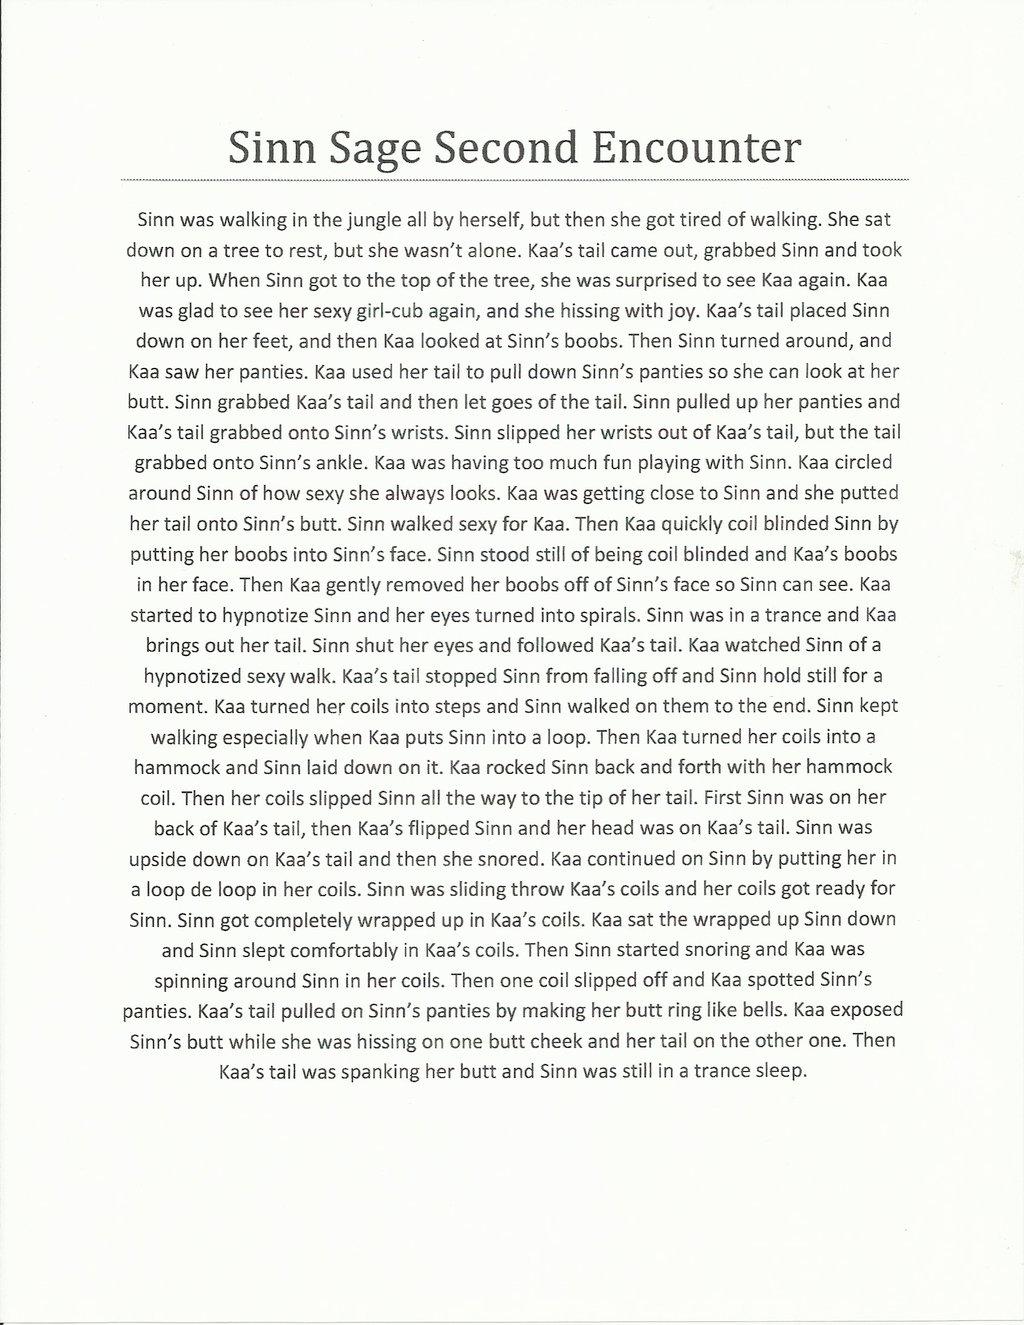 Sinn Sage Second Encounter By Thelastdisneytoon Dnqoc Jpg